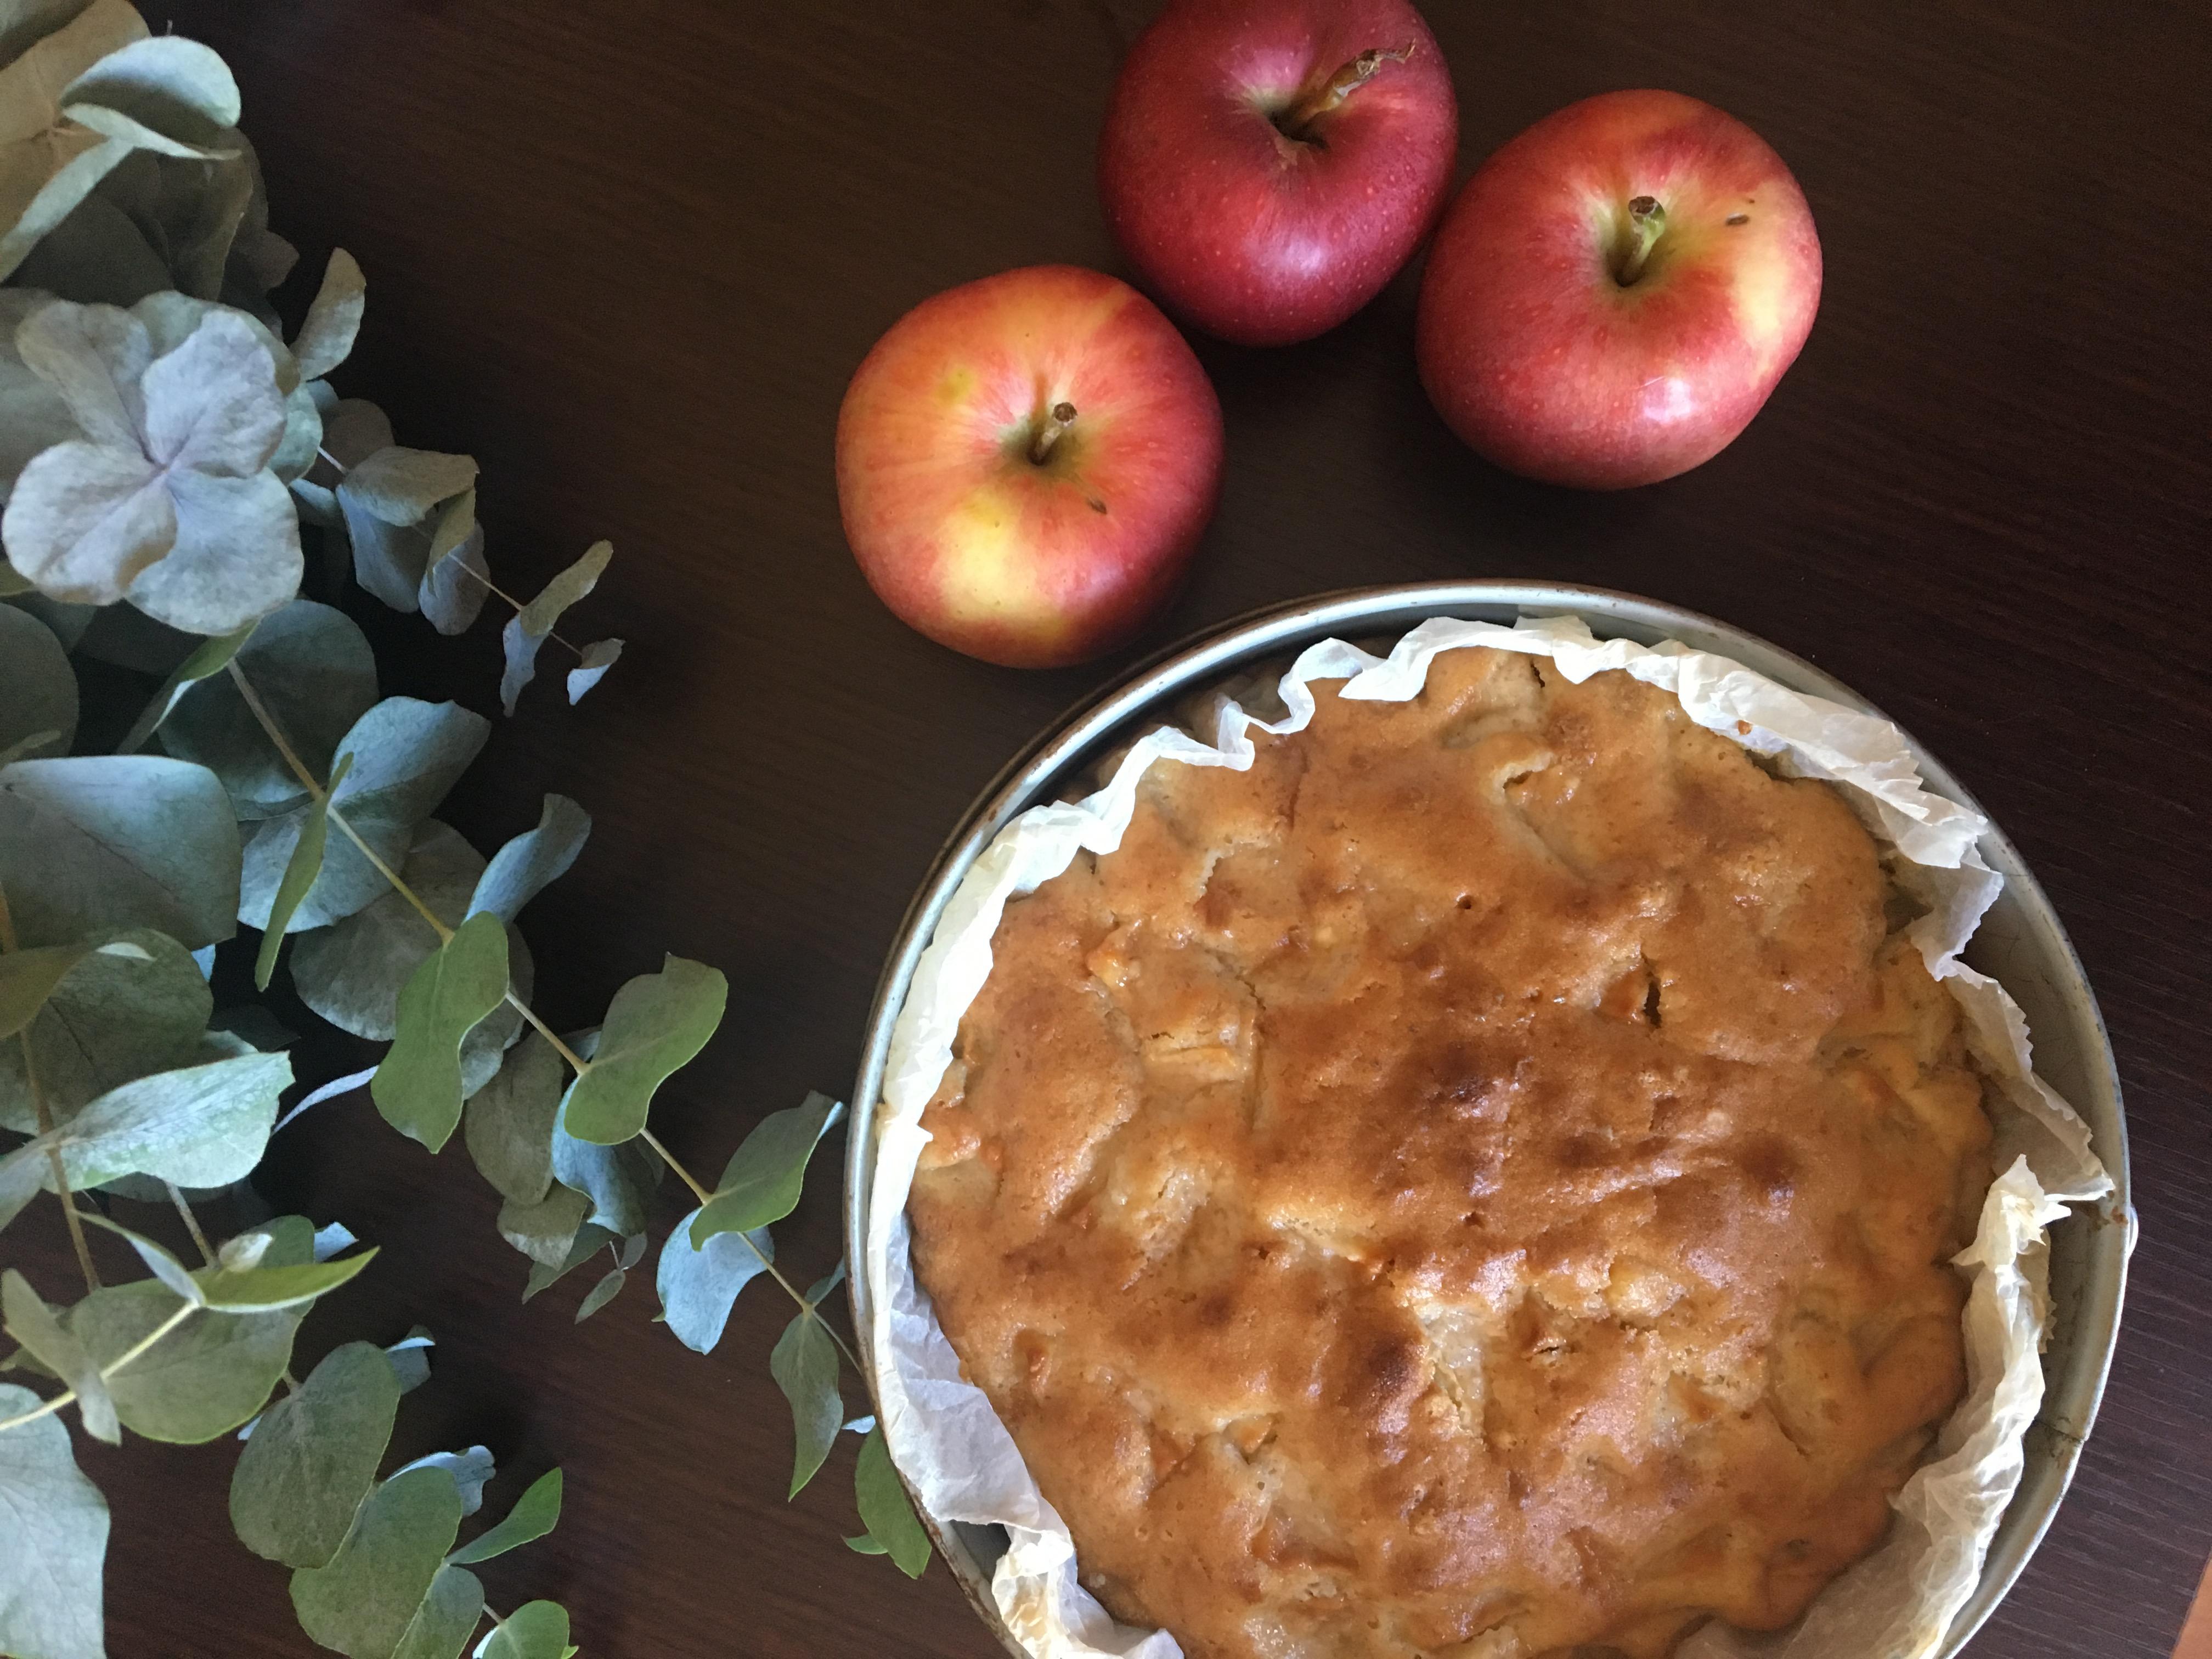 Torta di mele senza burro, late e uova